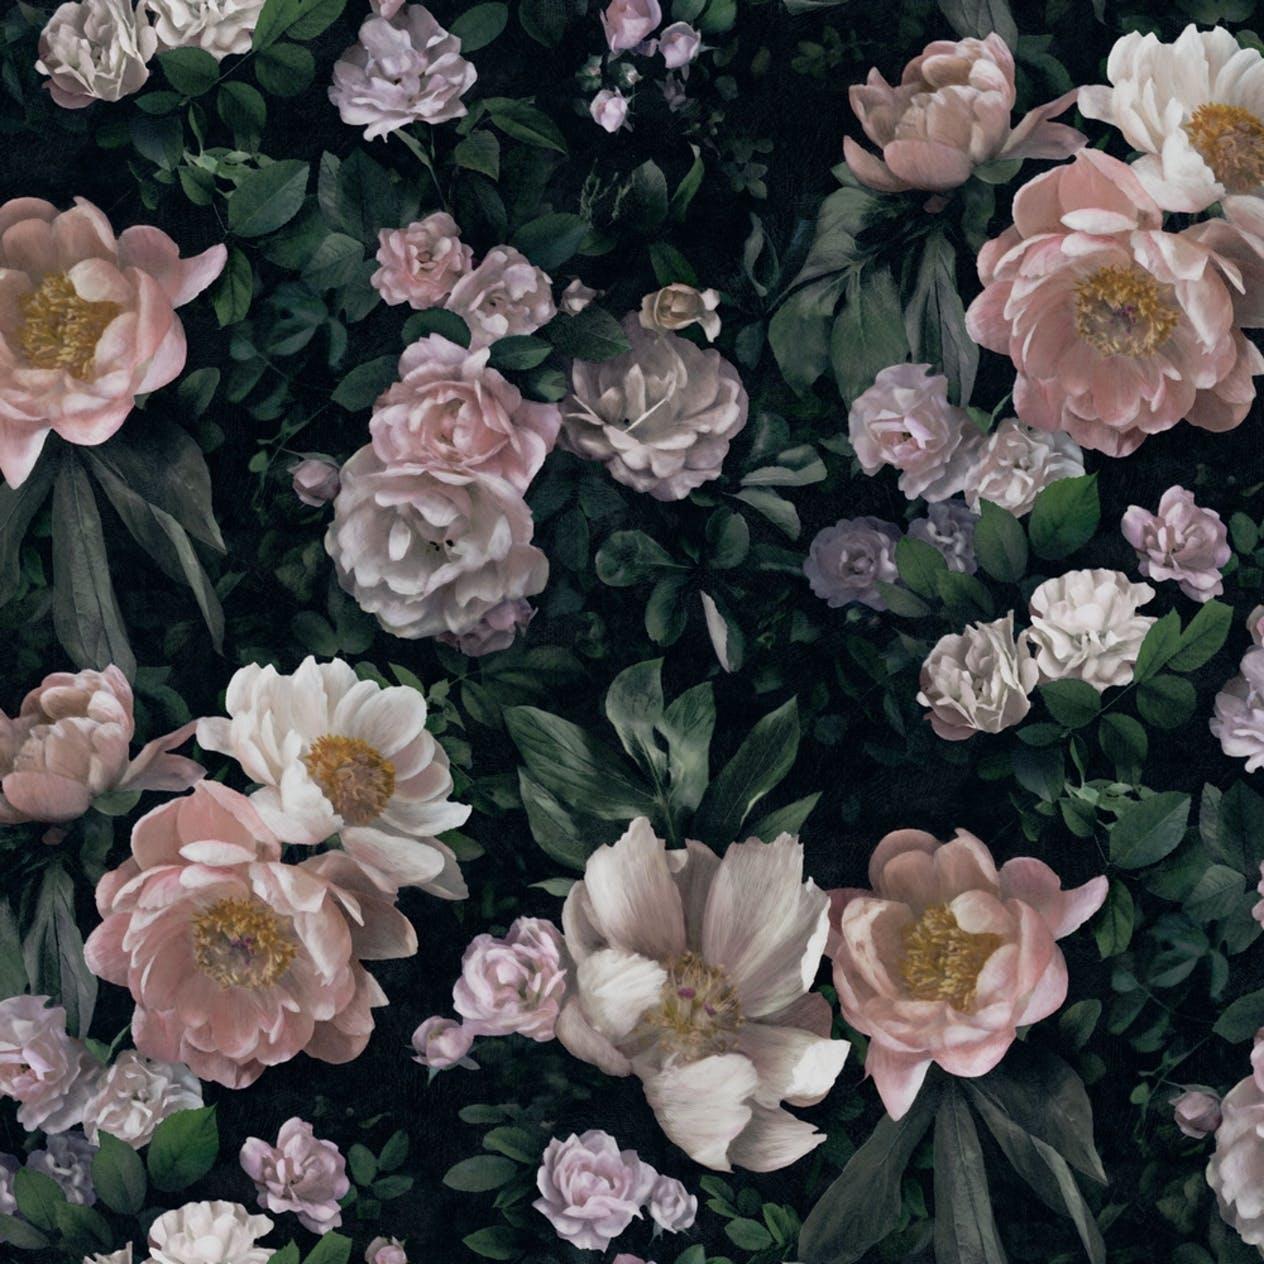 tapet-borastapeter-inbloom-new-dawn-rose-7234__49bb983d-7844-4a96-a8dd-d265251a3748.jpg